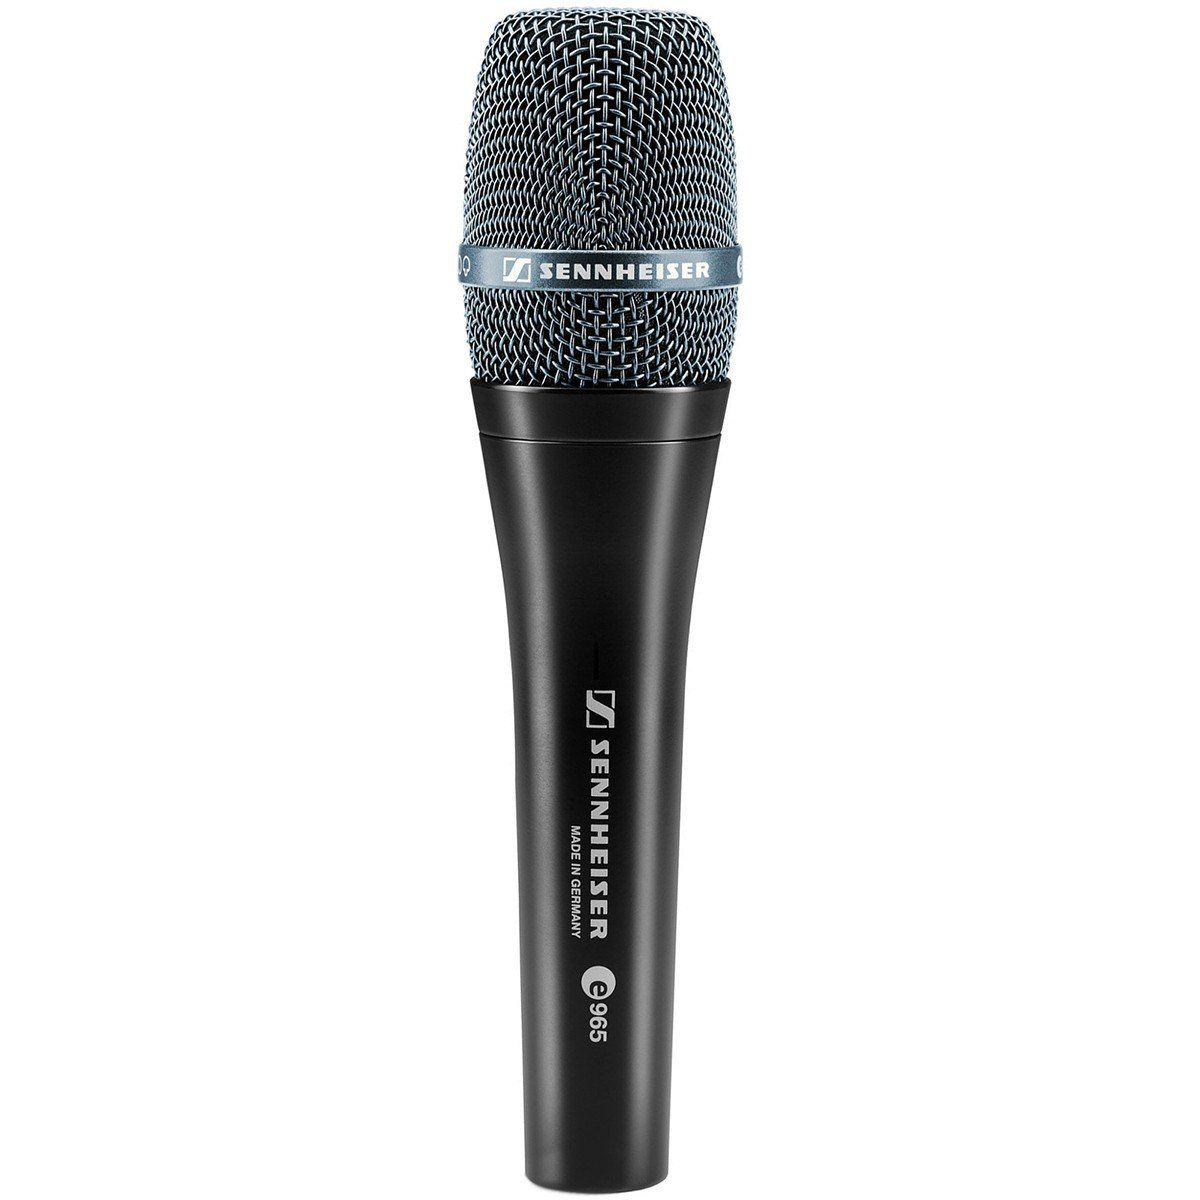 Sennheiser E 965 Microfone Condensador Sennheiser E965 para Estúdio e Palco